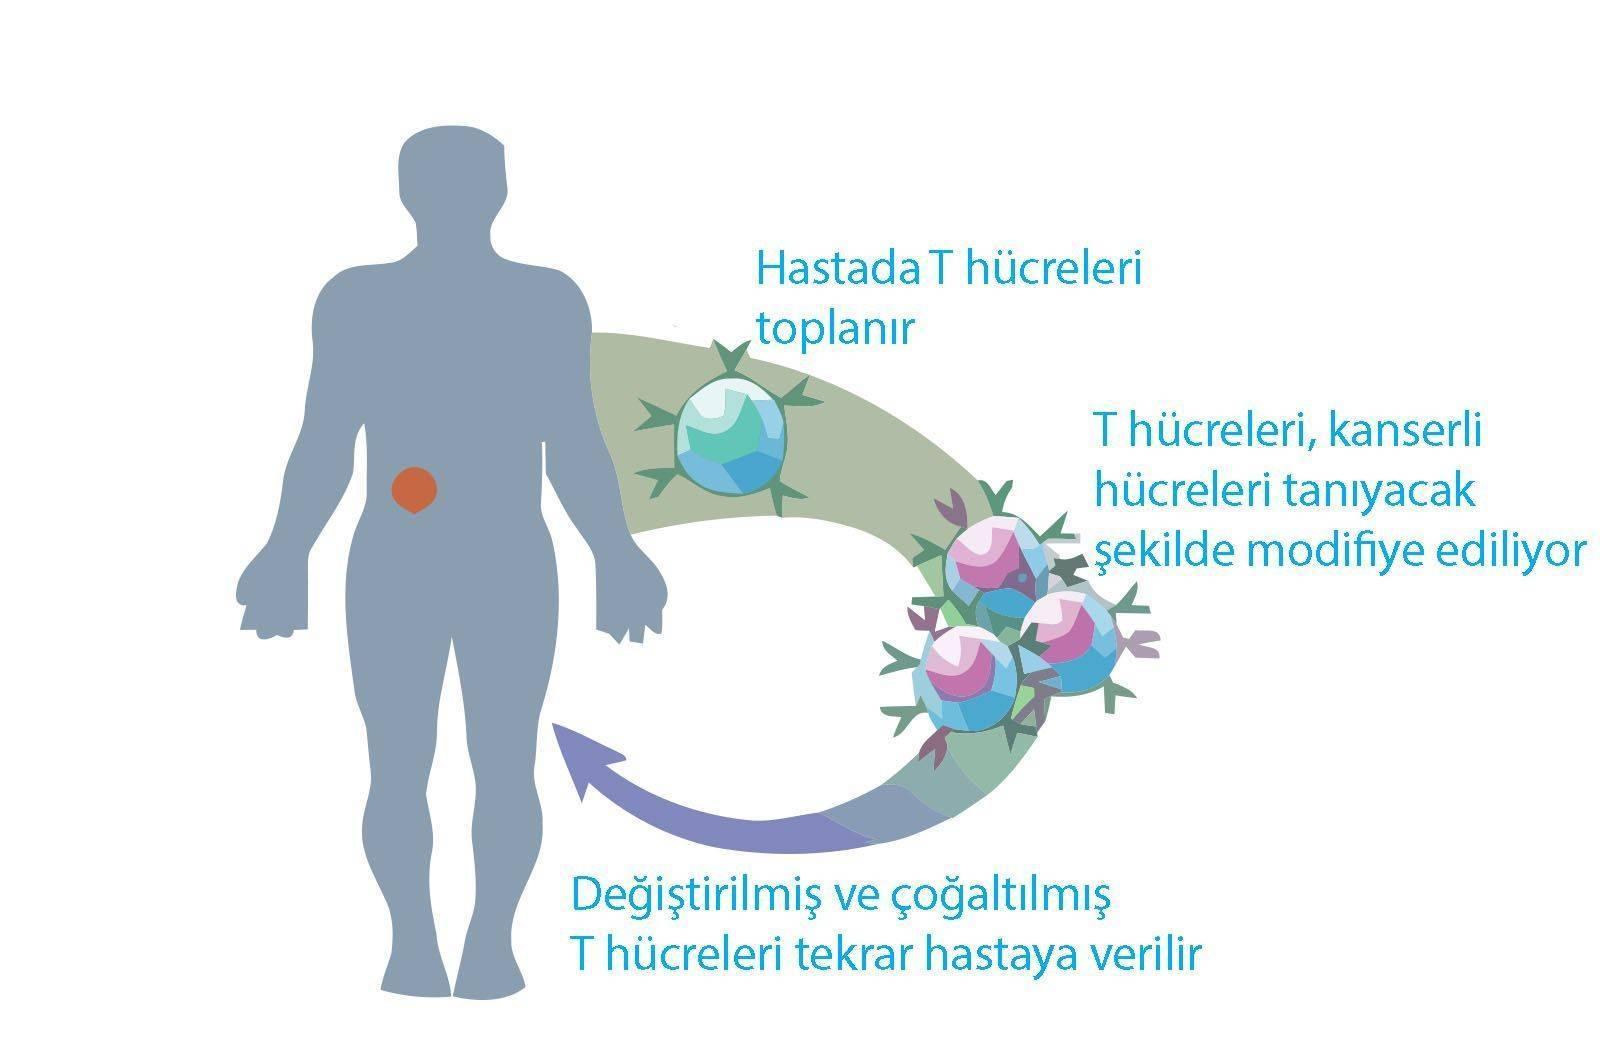 adoptiv t hucre tedavisi yumurtalik kanseri losemiler